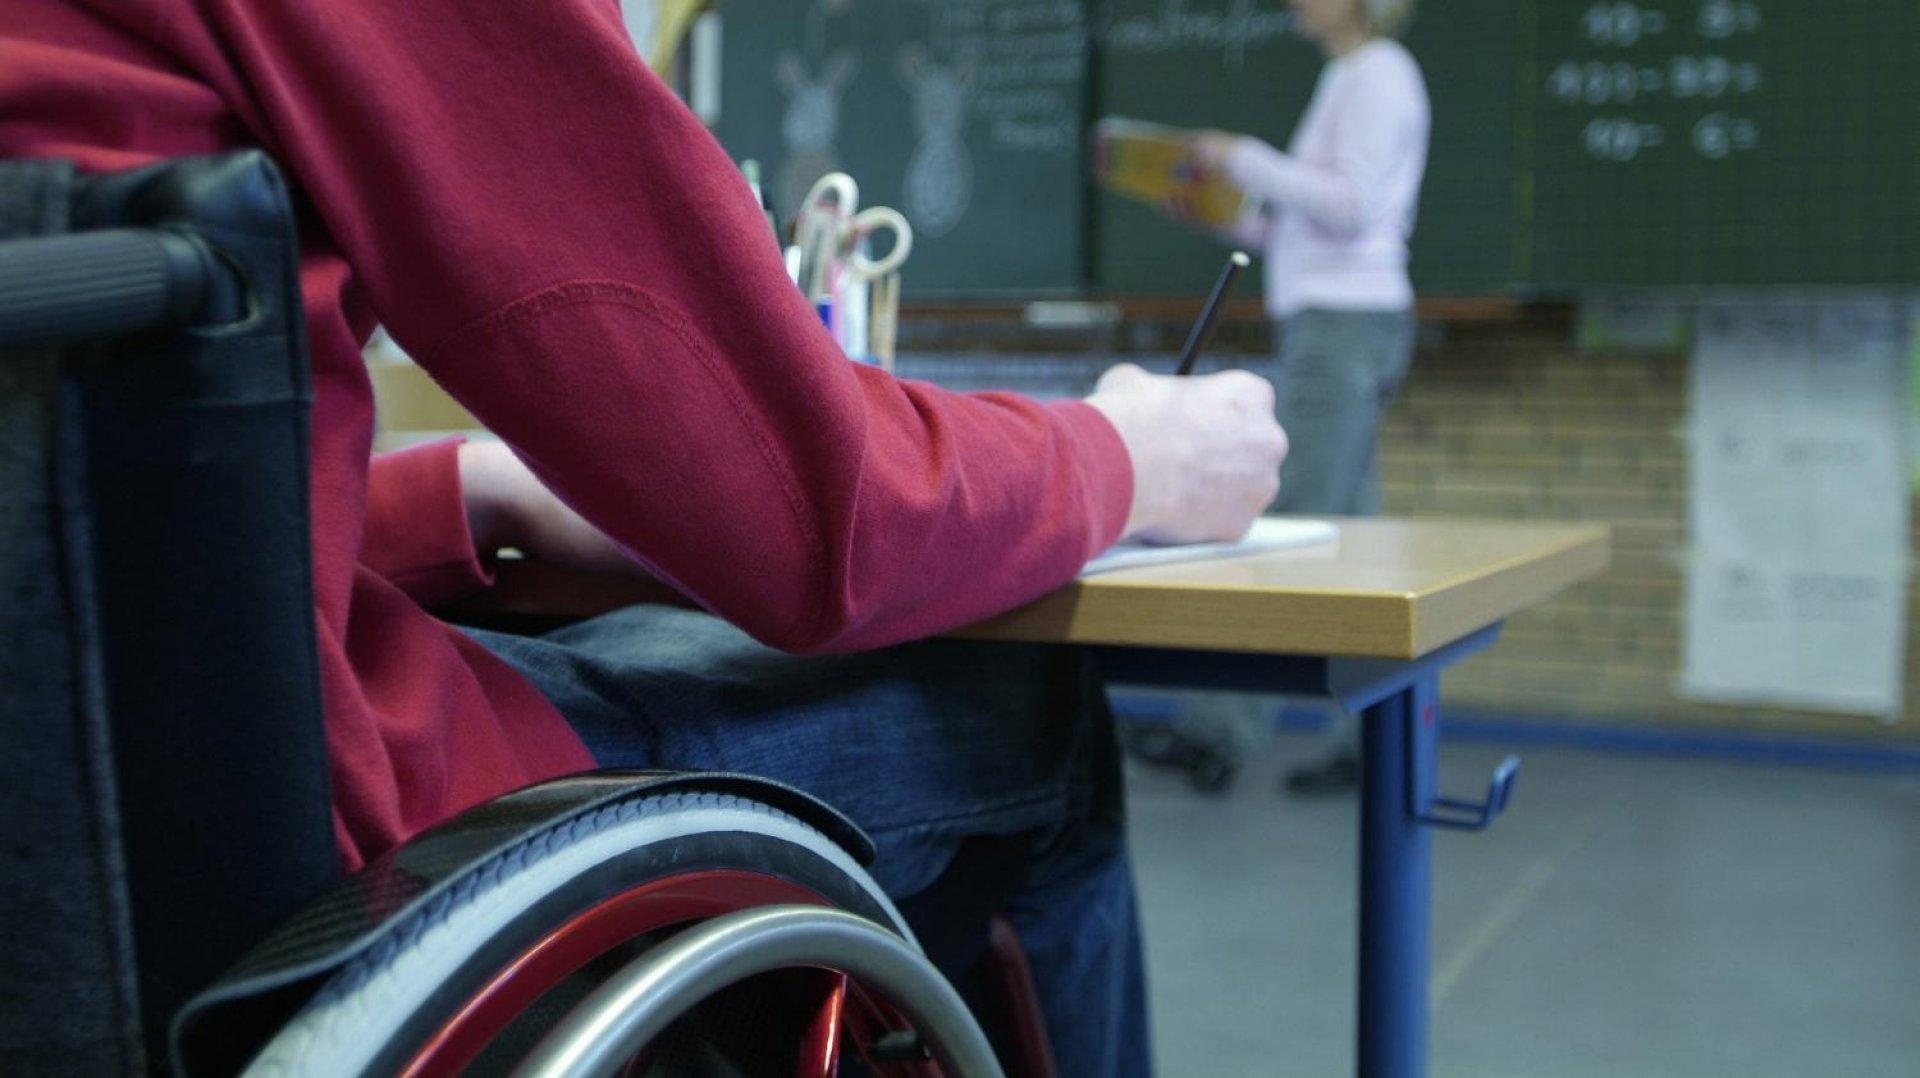 alunni disabili in classe